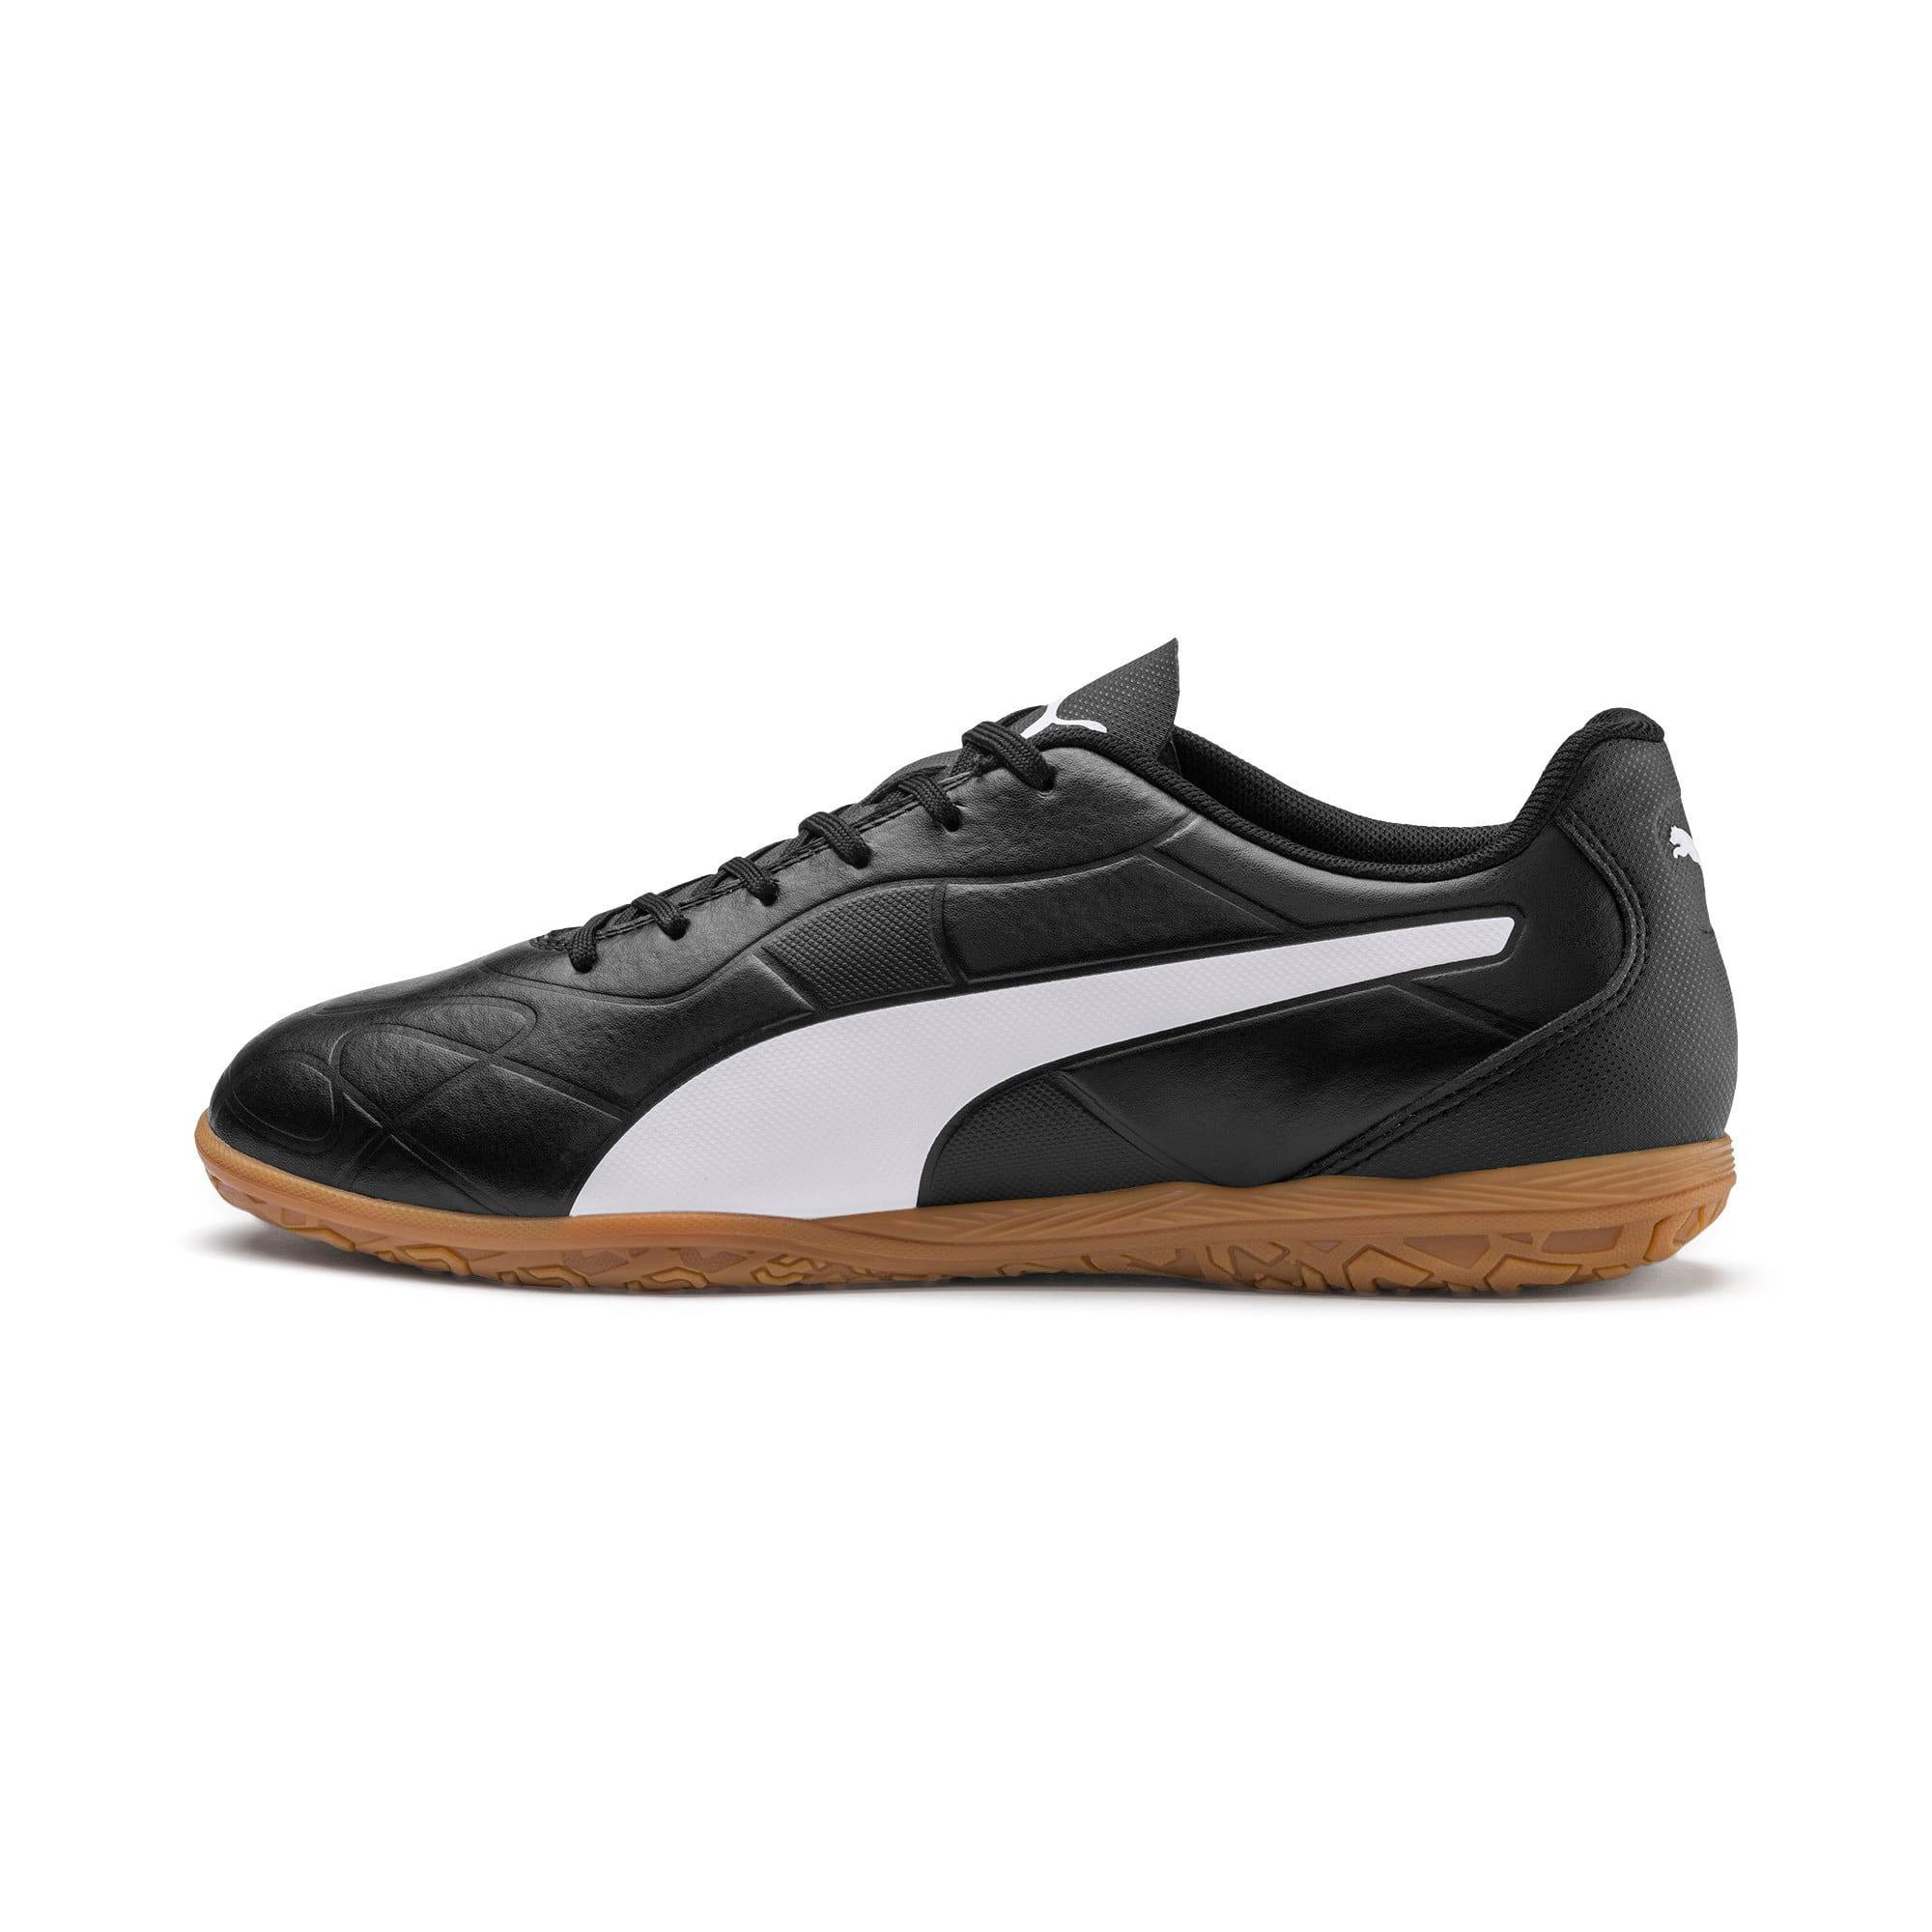 Thumbnail 1 of Monarch IT Men's Football Boots, Puma Black-Puma White, medium-IND